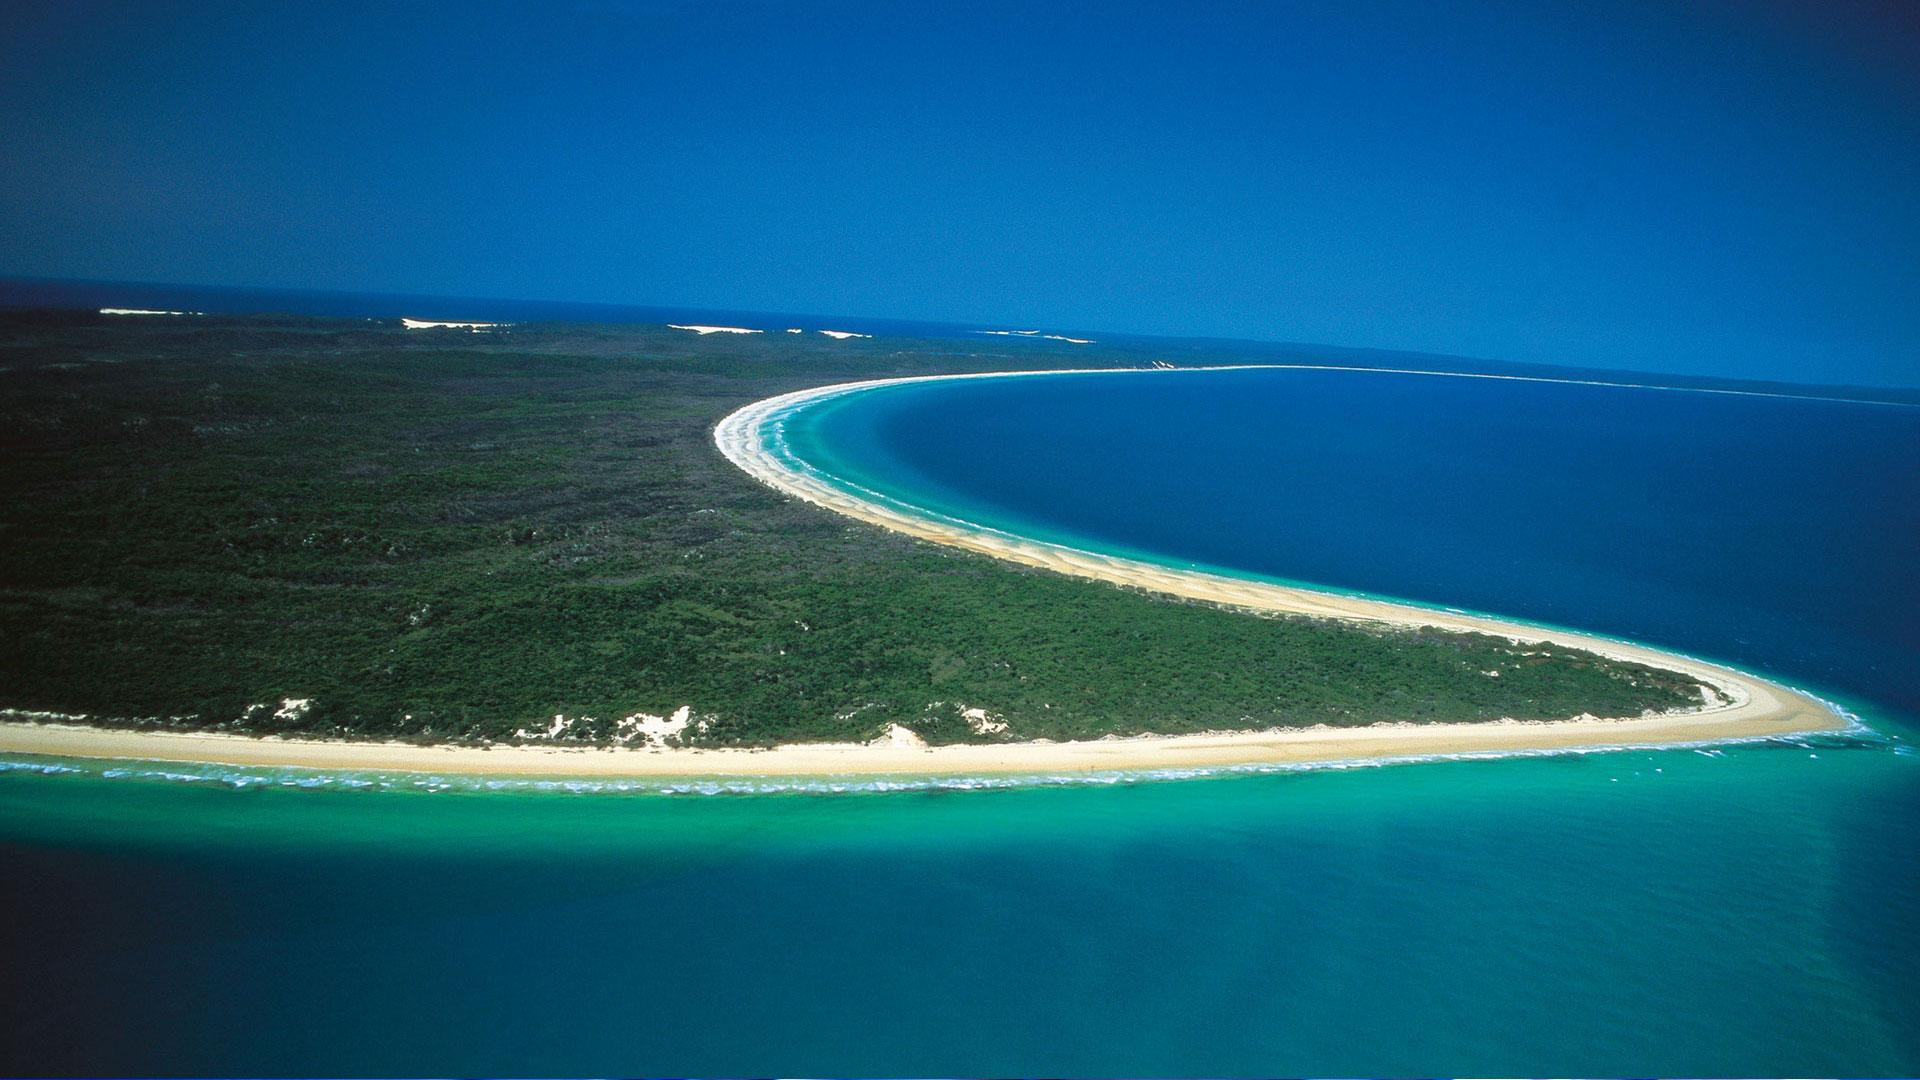 Fraser Island Birds Eye View